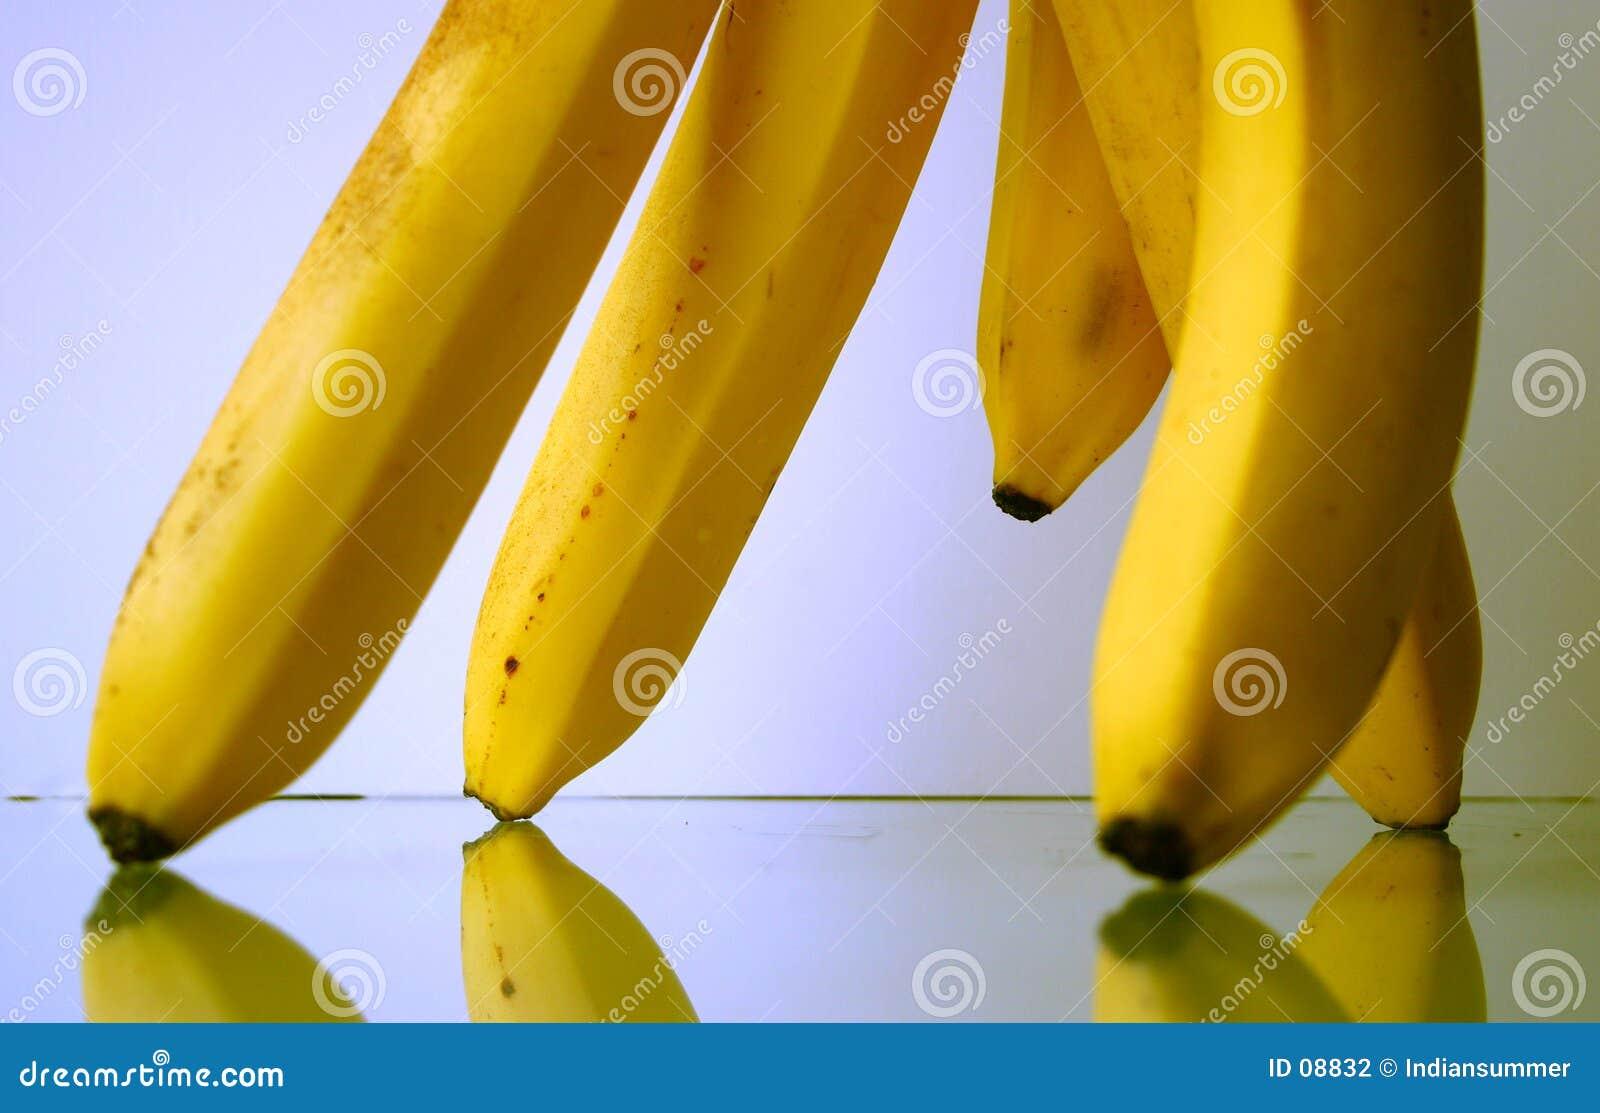 Défilé II de bananes